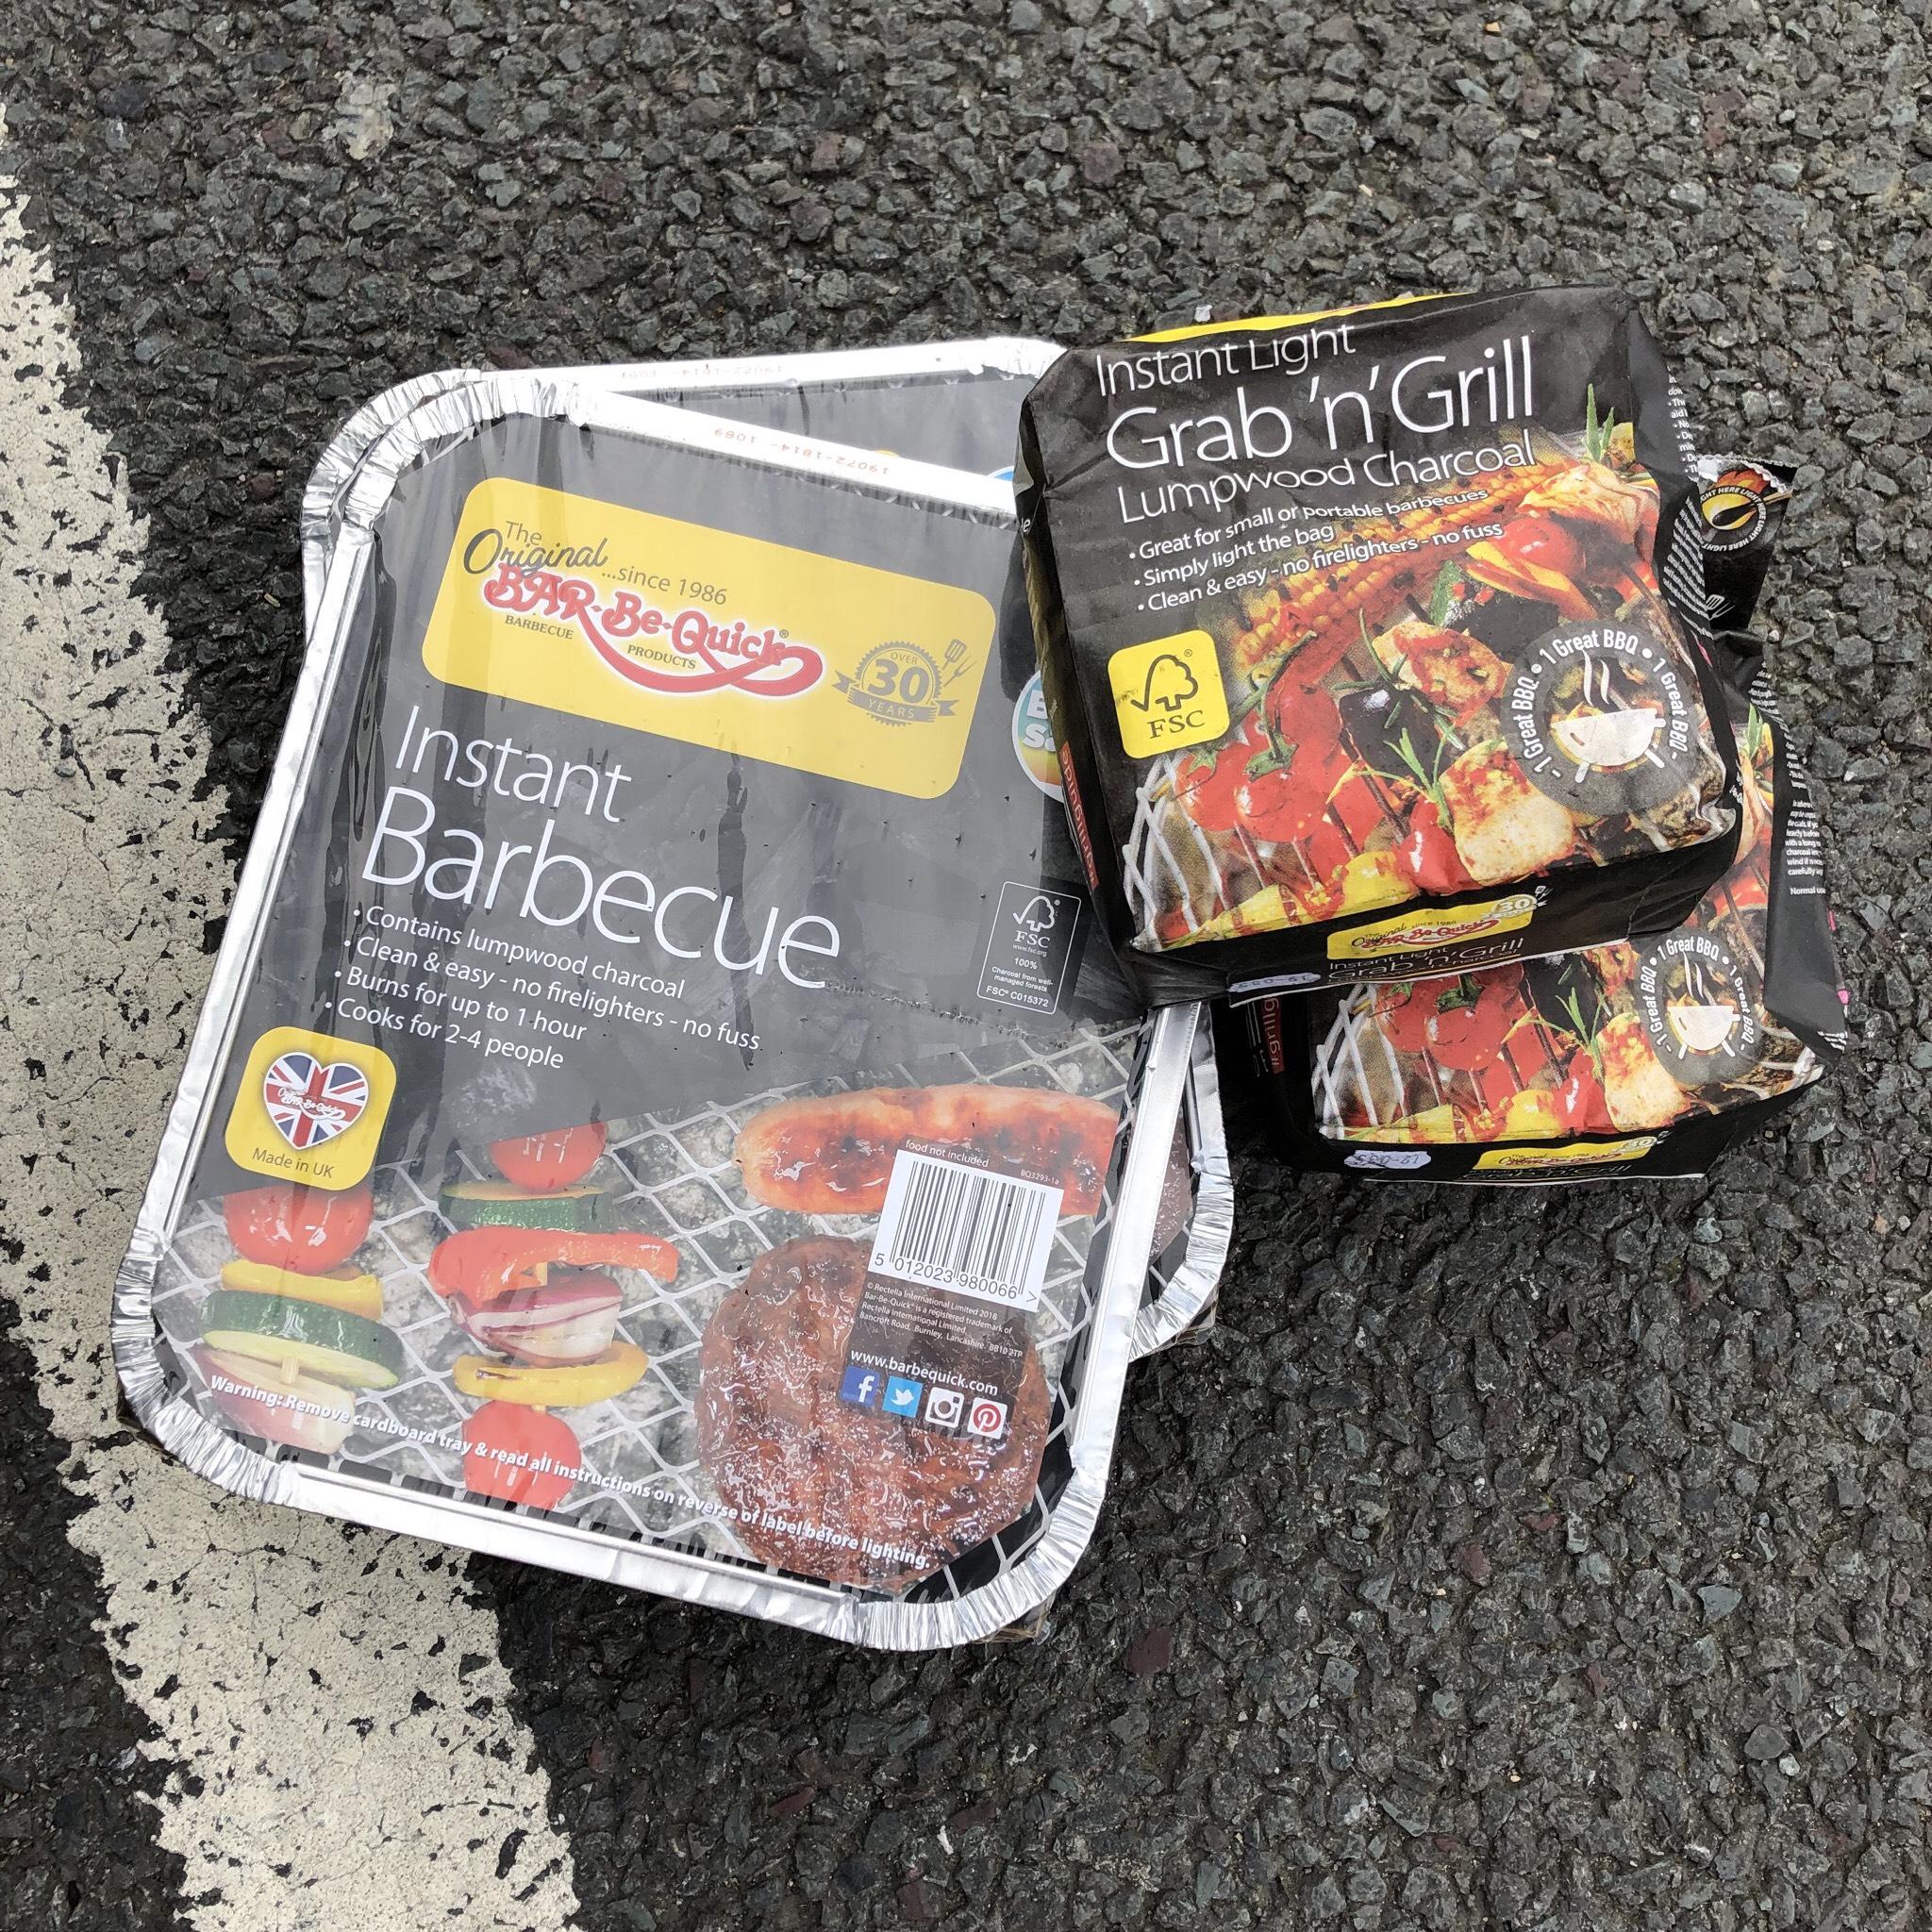 Instant BBQ 84p / Grab 'n' Grill Bags 72p @ Asda